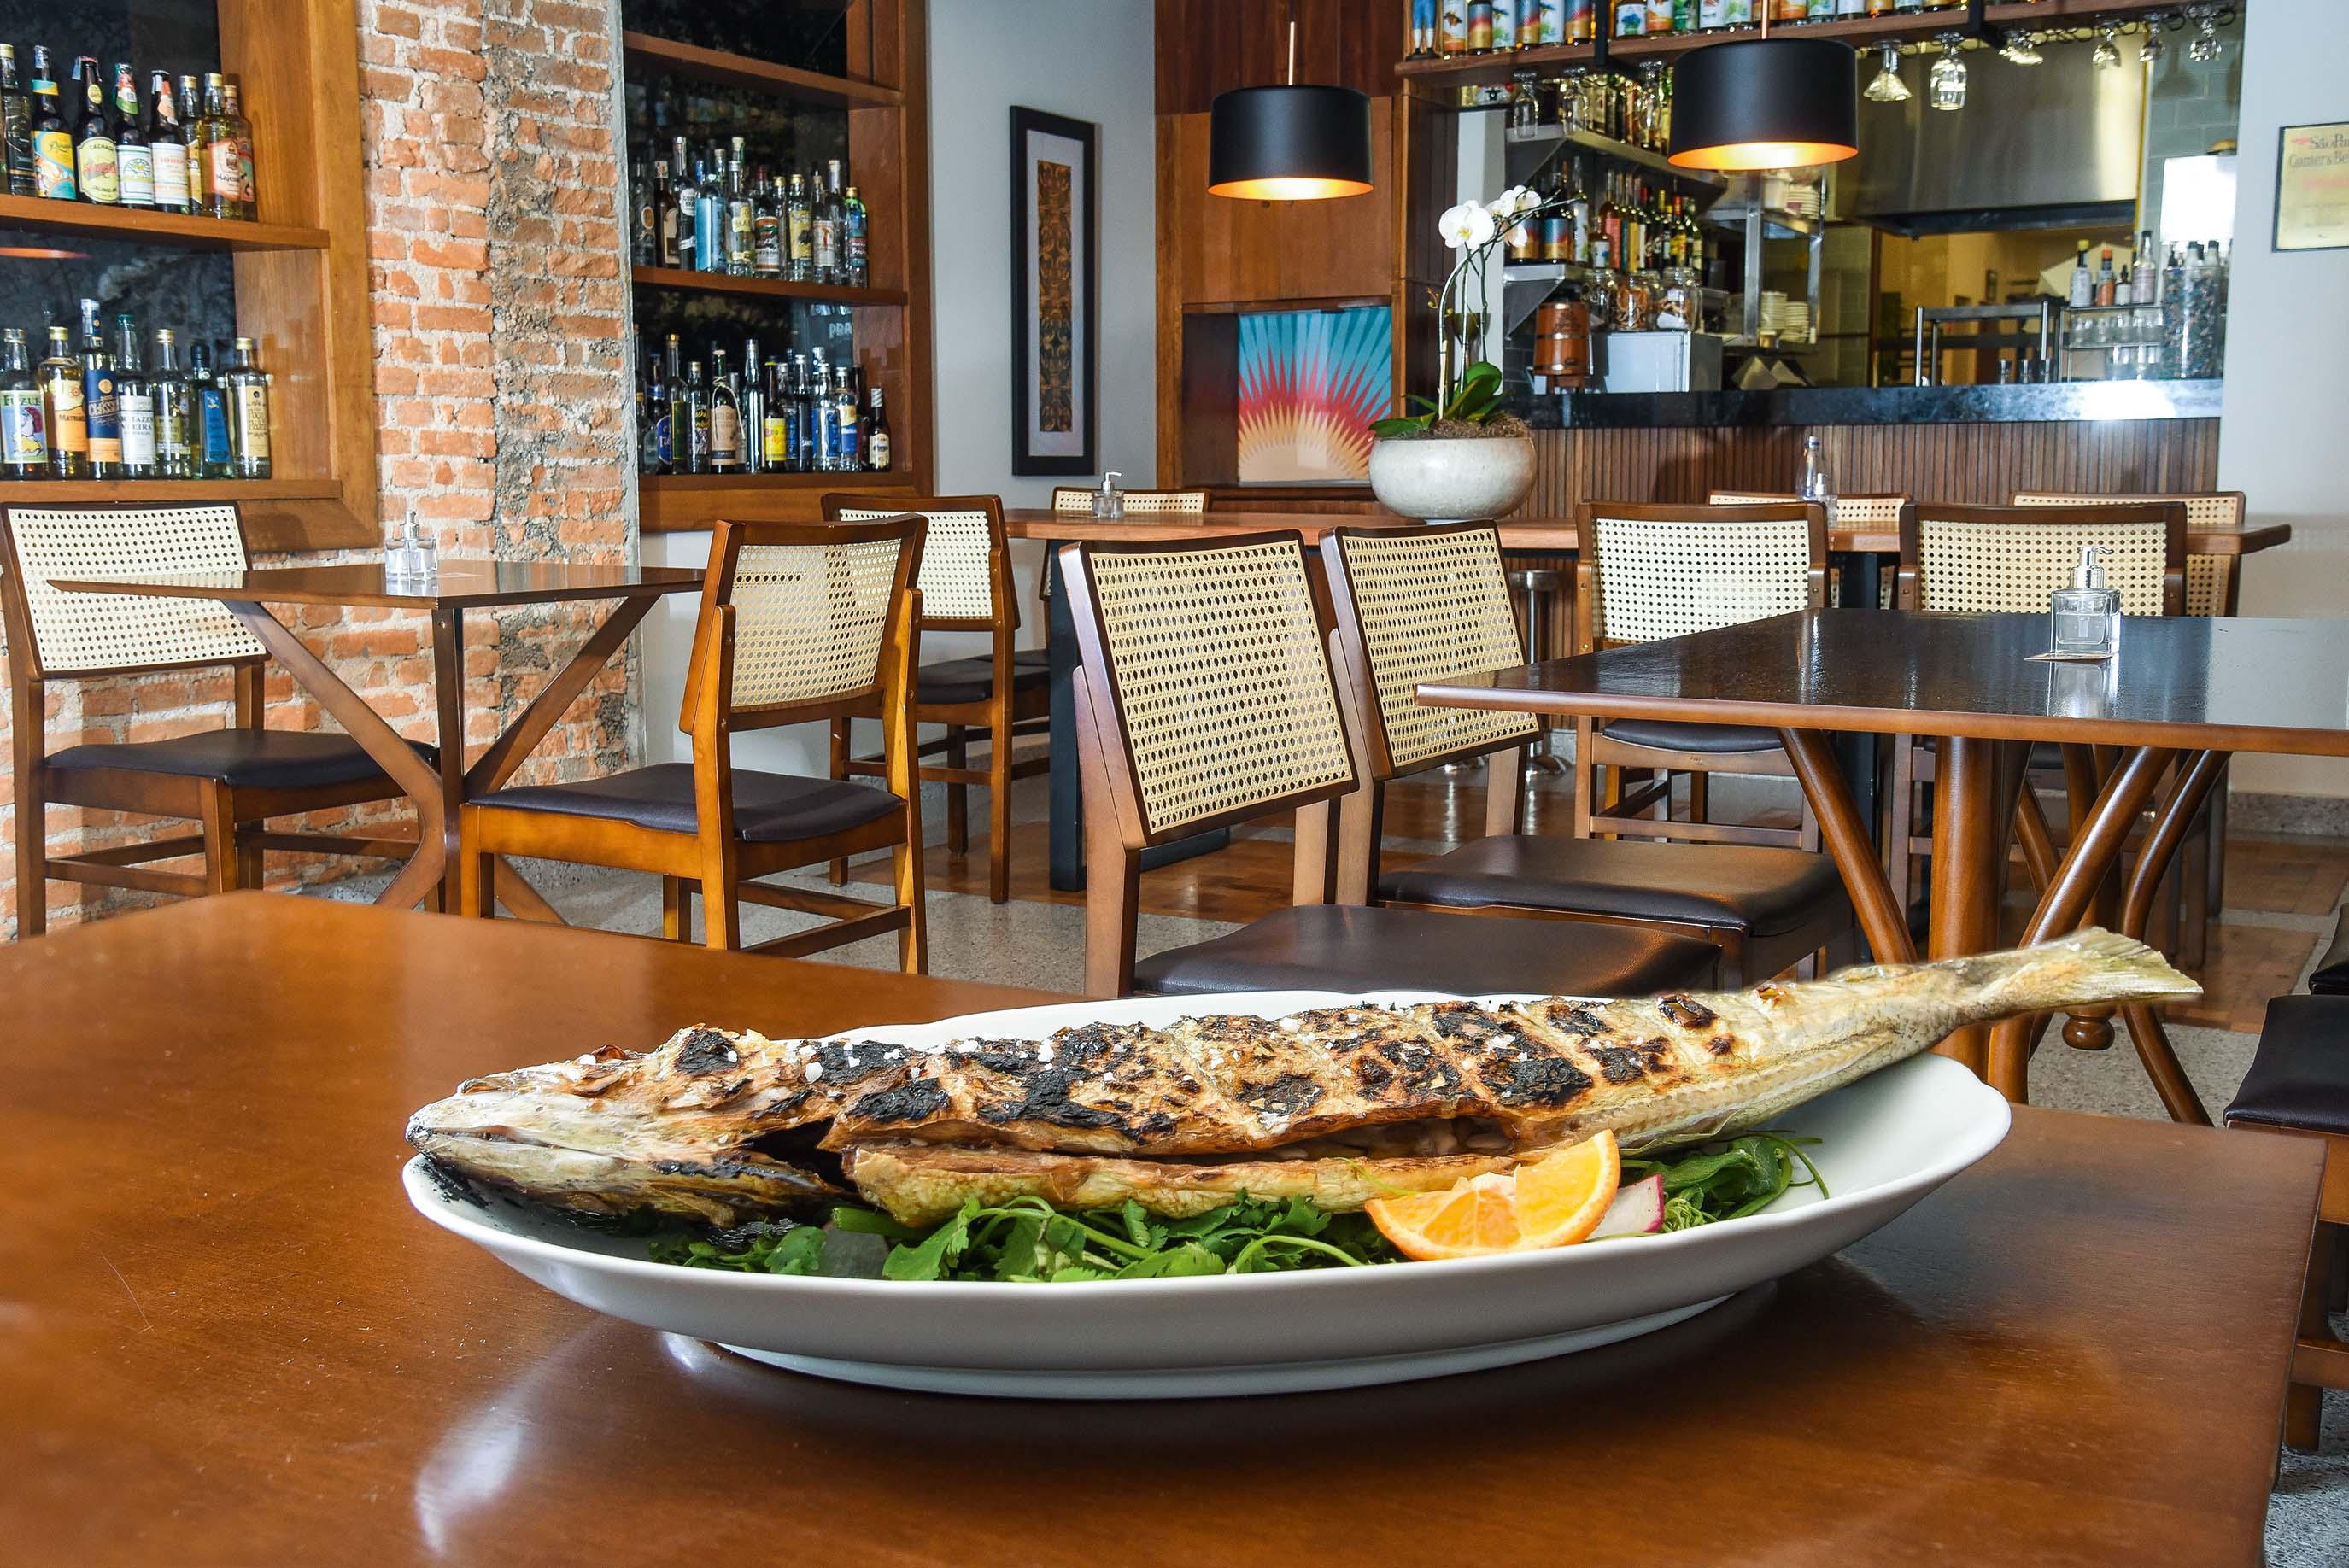 Comer & Beber 2020/2021 - Restaurantes - Brasileiro - Jiquitaia